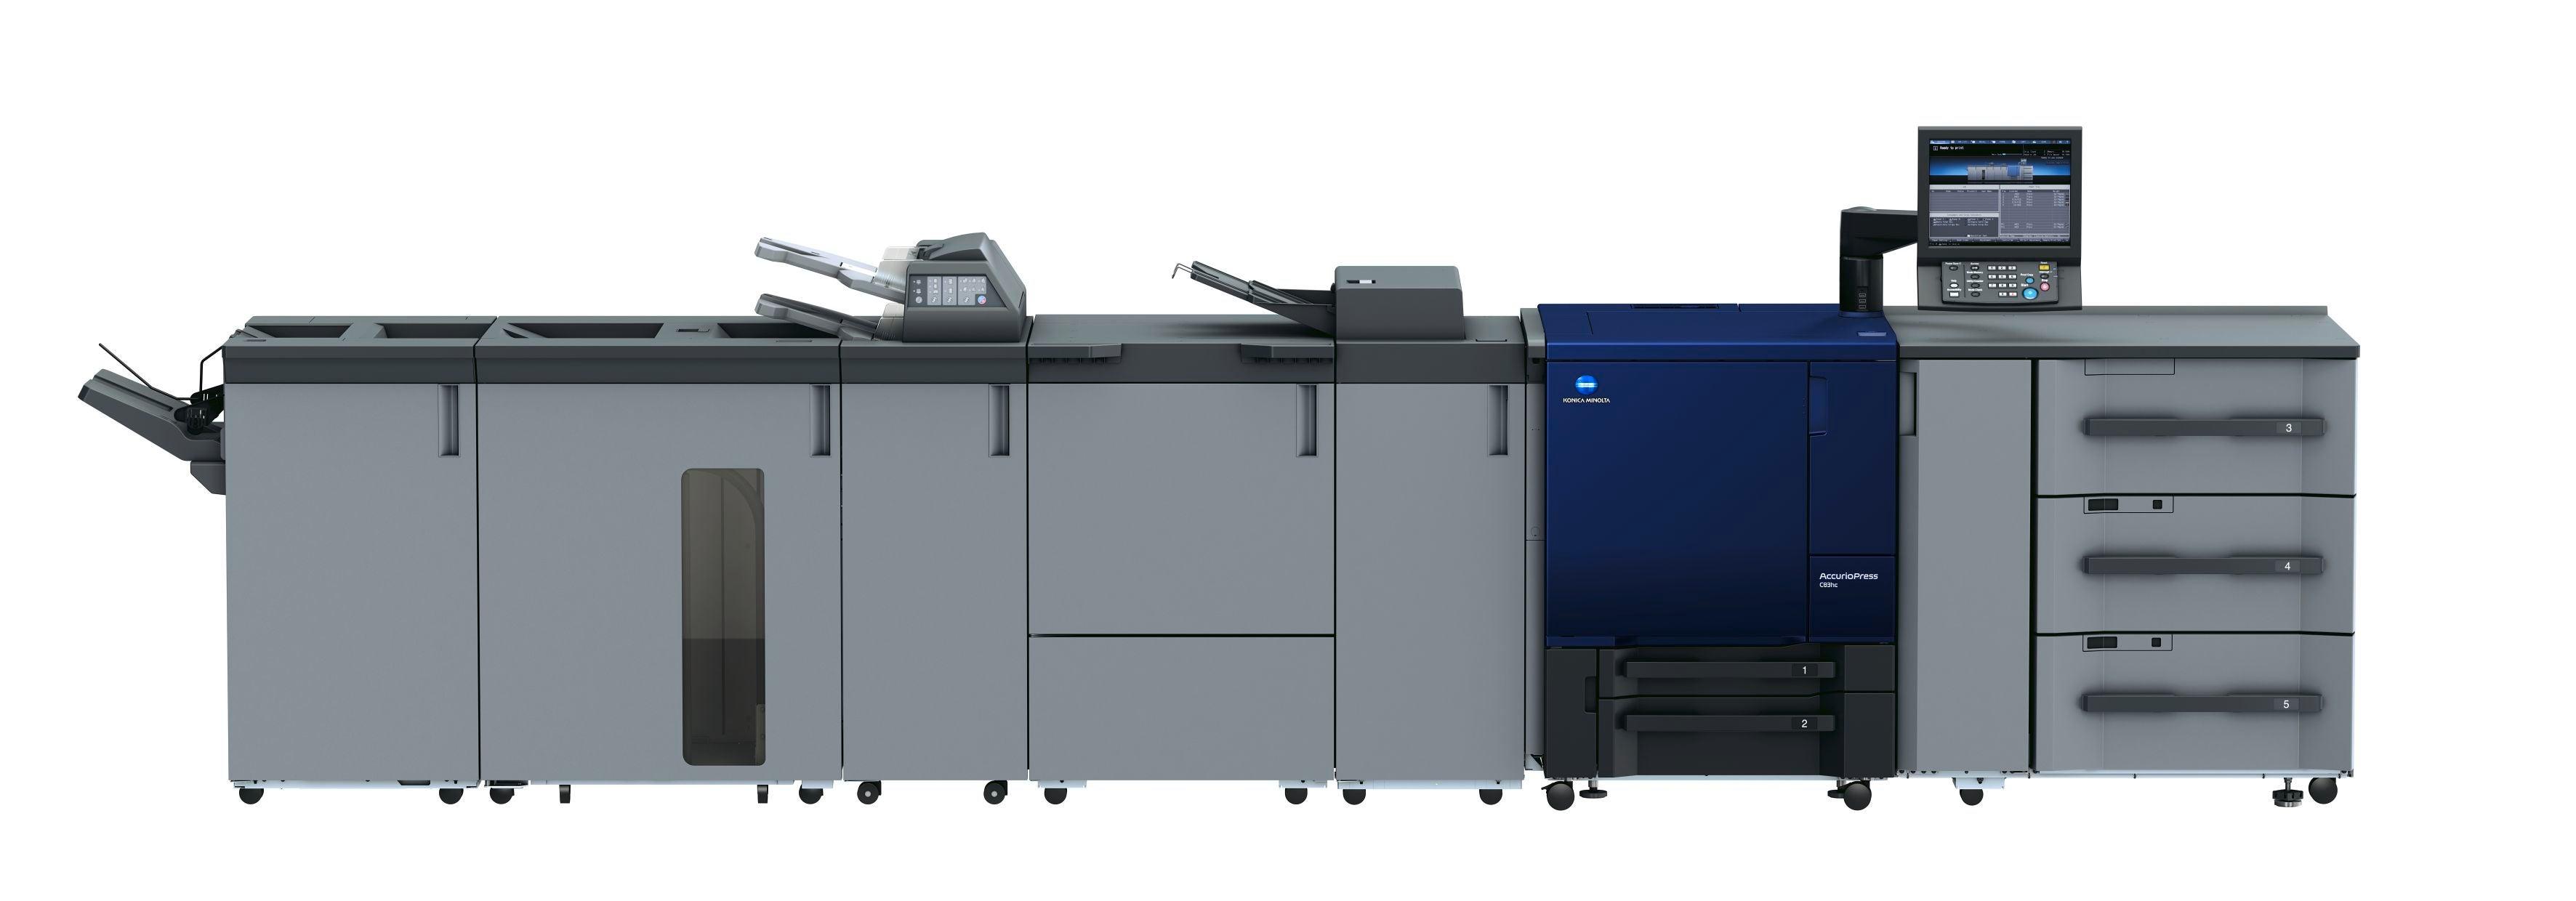 Imprimante professionnelle Konica Minolta accurioPress c83hc